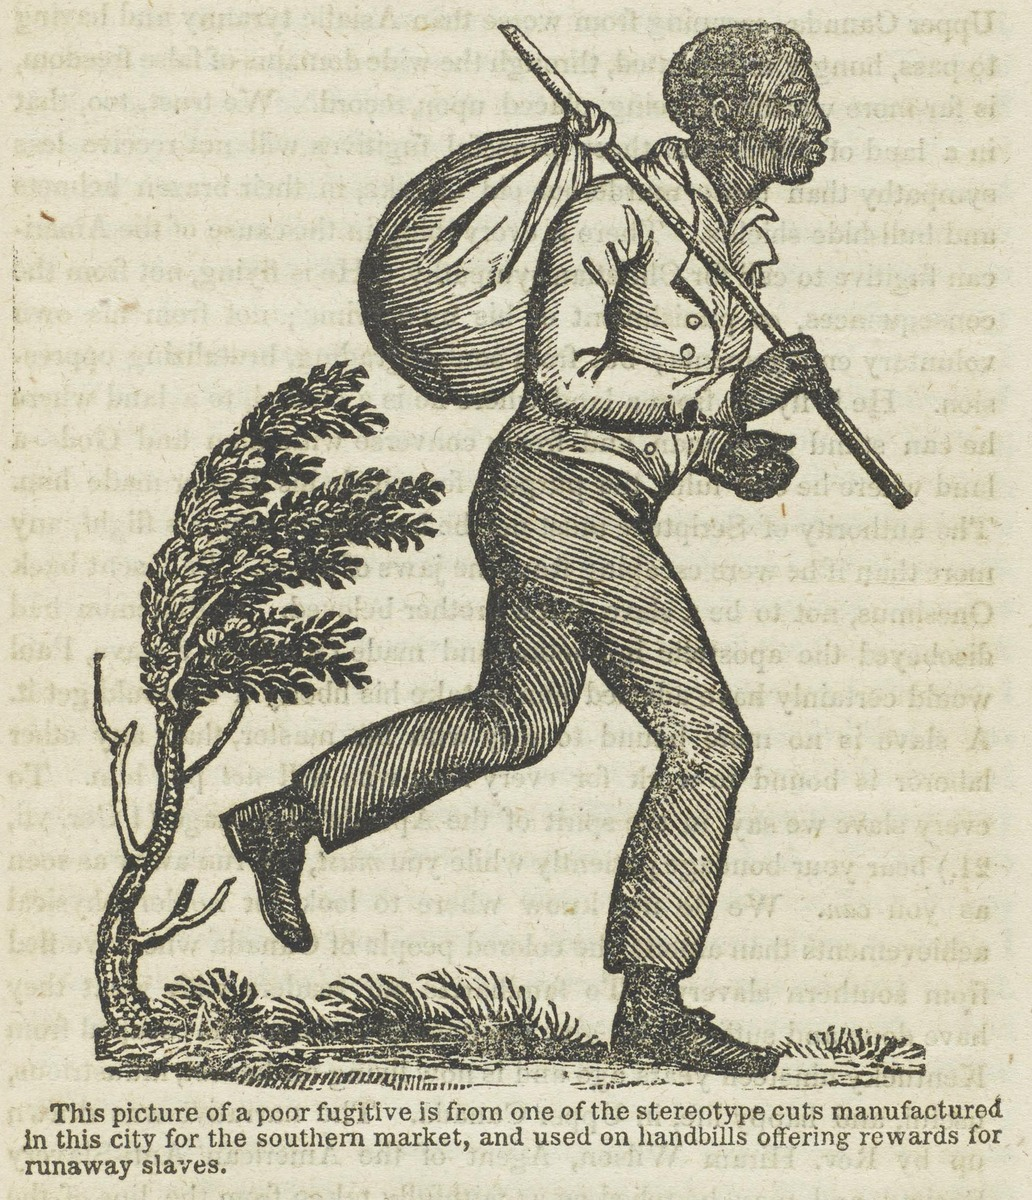 Anti-slavery record. Vol. 3 (July 1837), page [1]